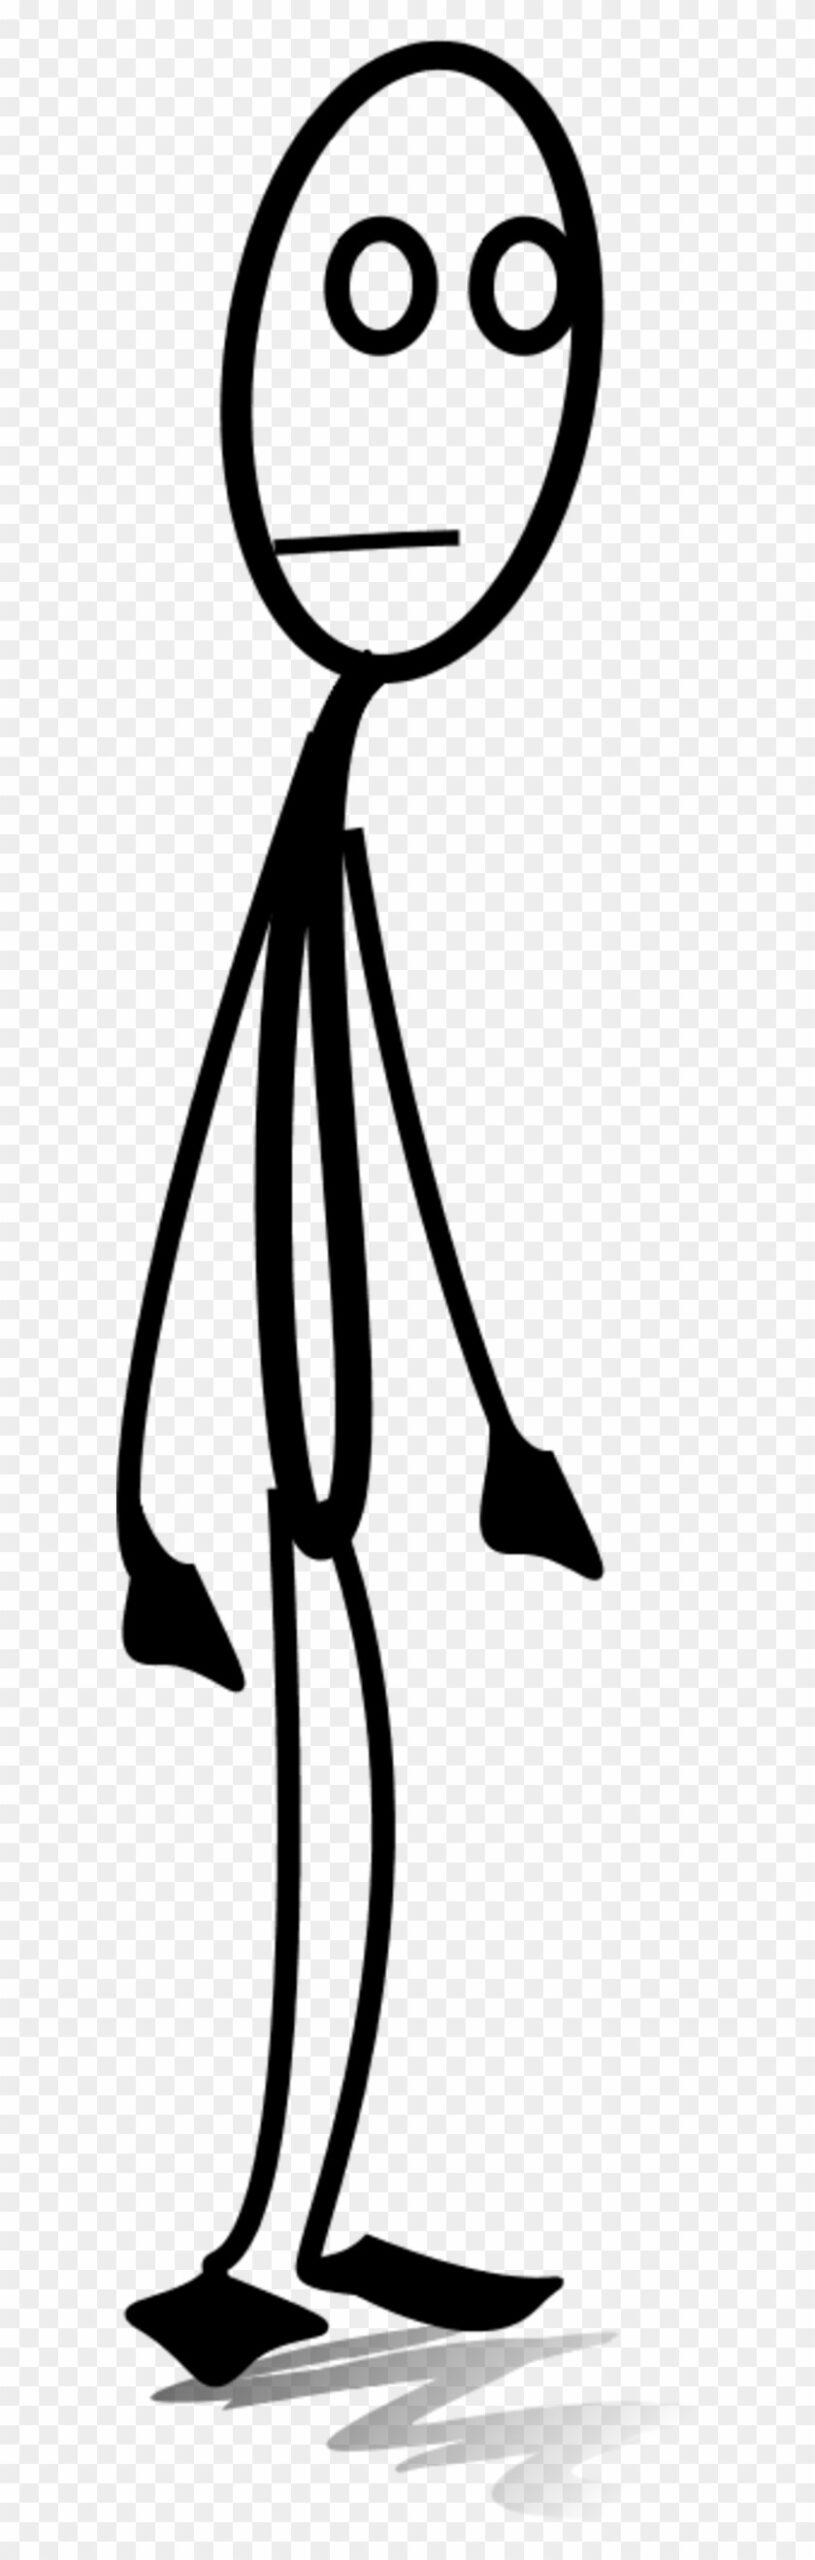 Thin Clipart Skinny Clip Art Image Provided.